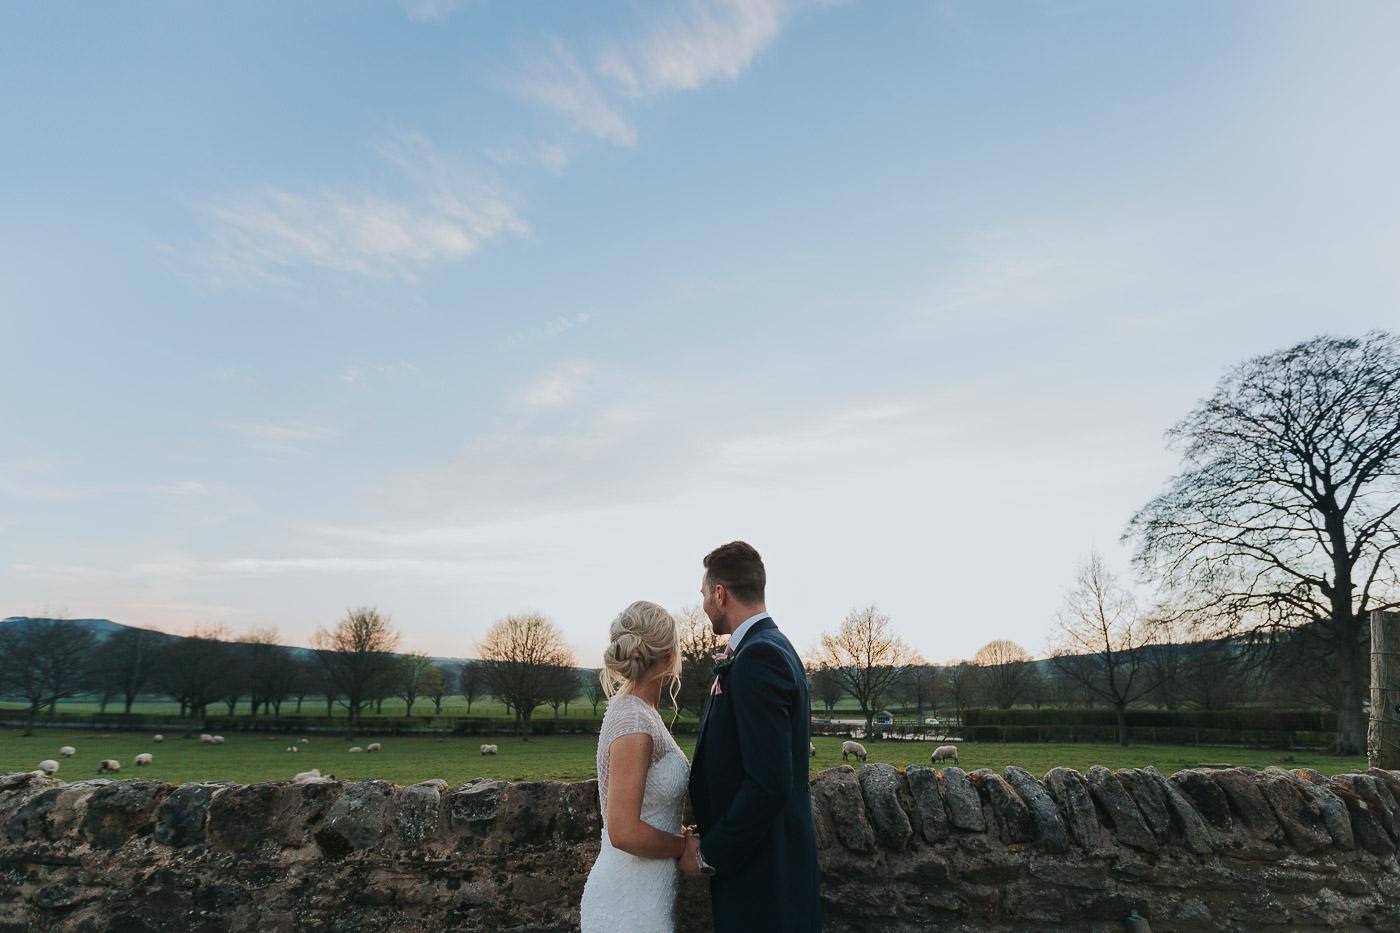 Tithe Barn - Laura Calderwood Photography - 29.3.19 - Mr & Mrs Lancaster290319-175.jpg